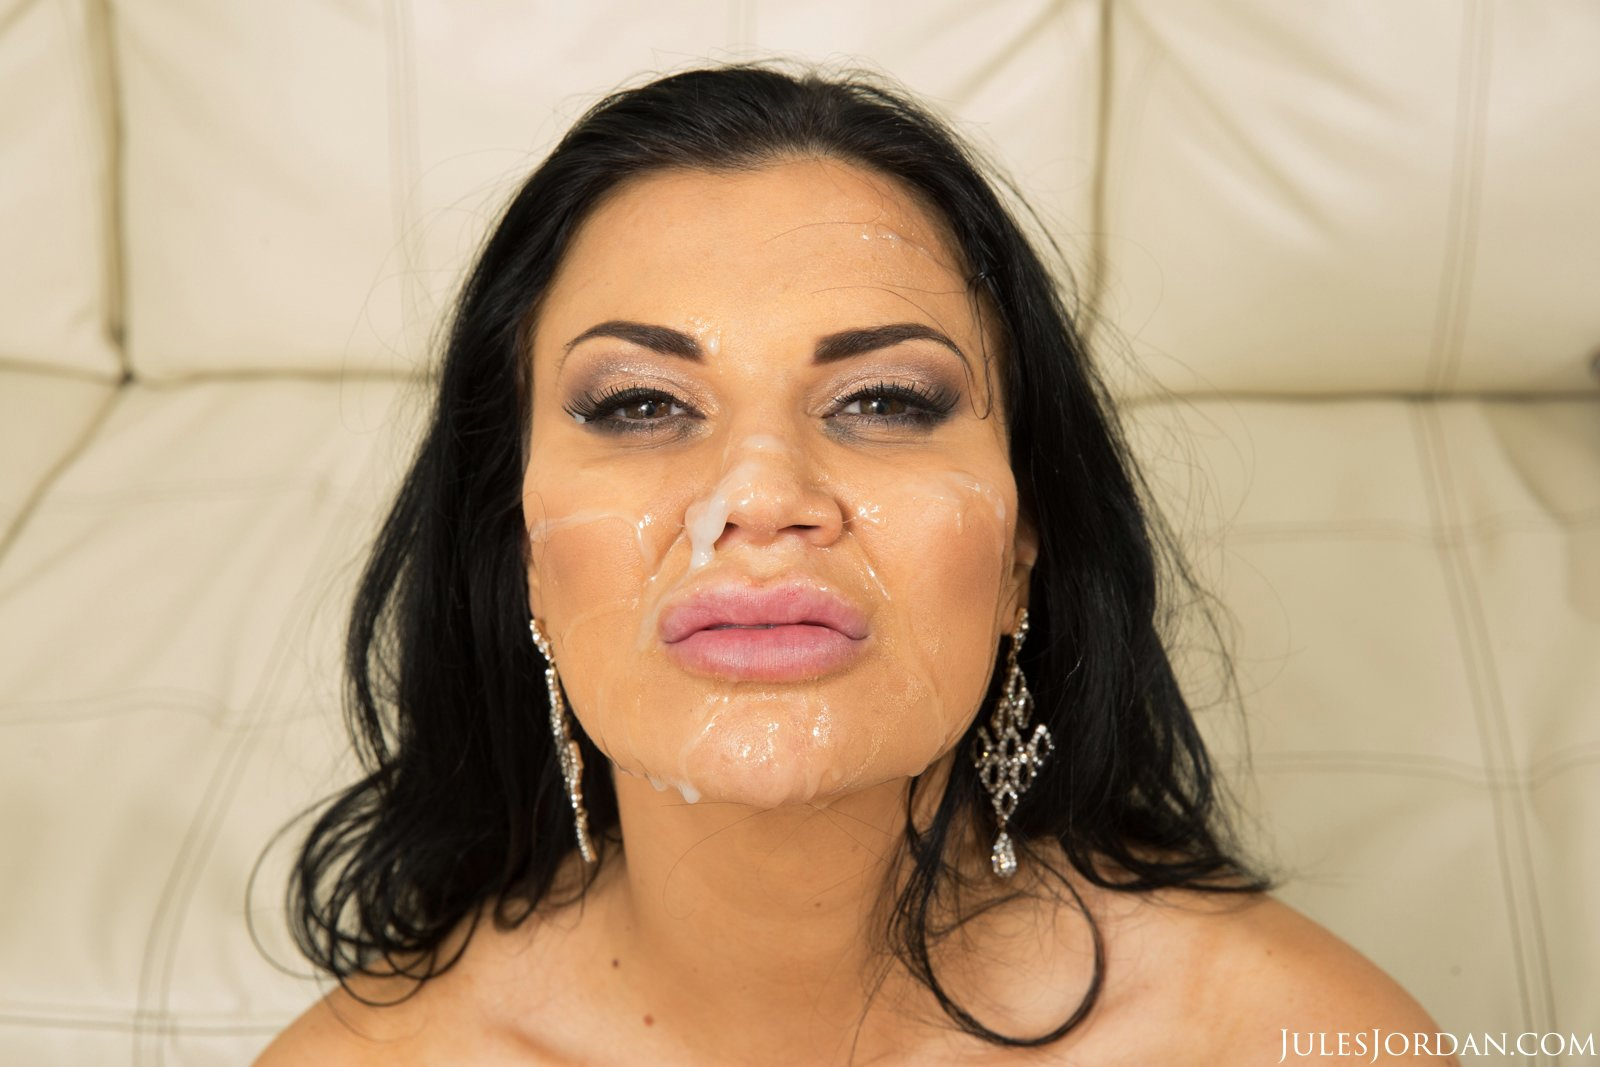 Brothers Throbbing Cock Makes Jasmine Cum On Gotporn